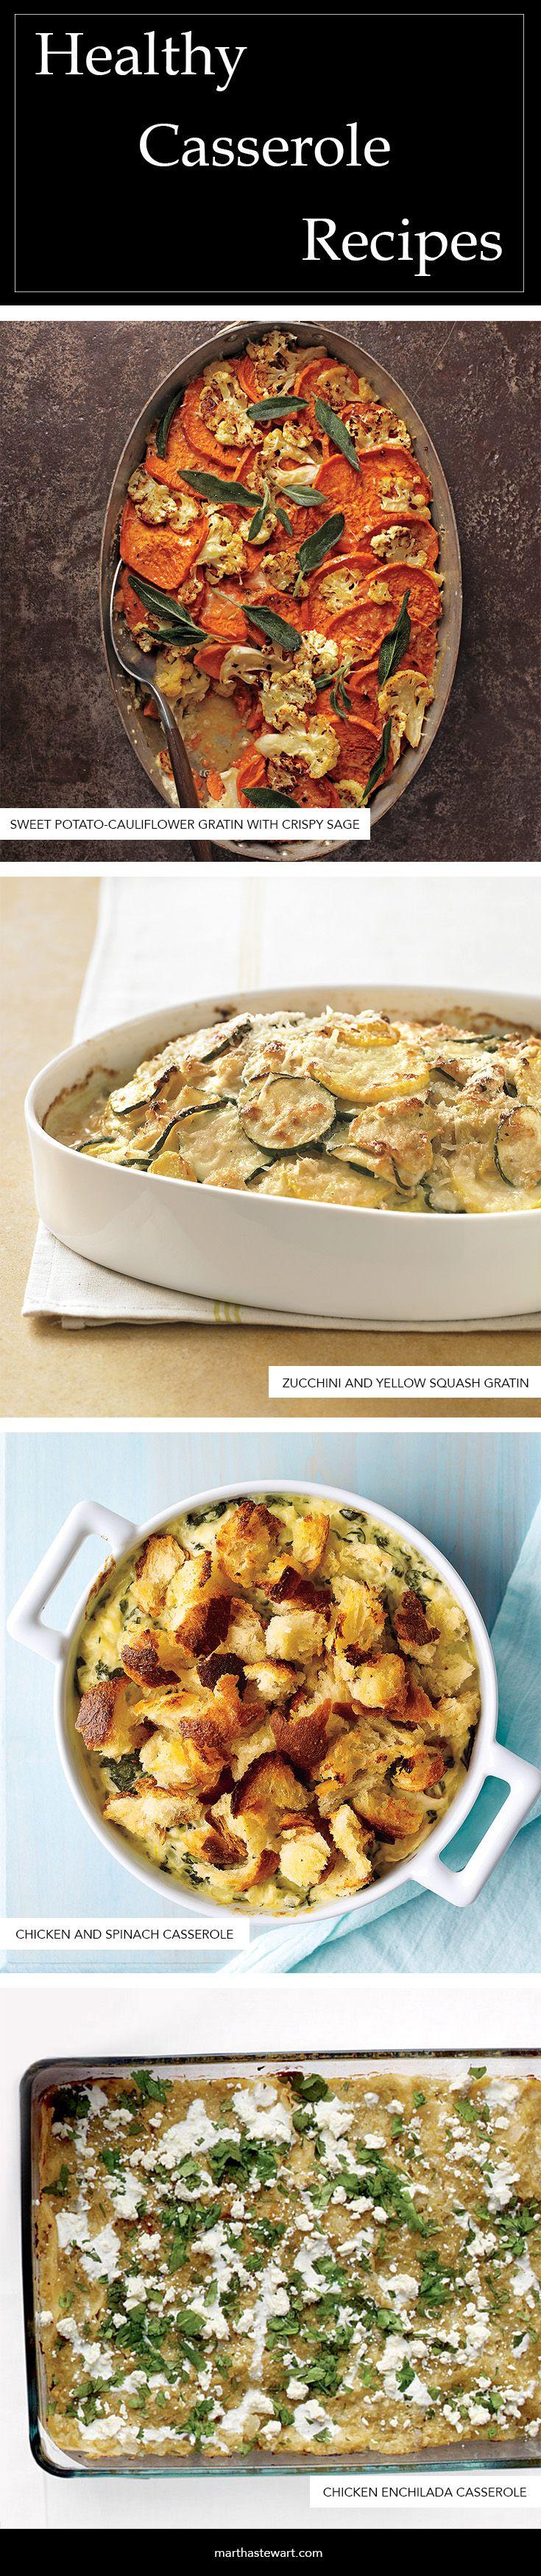 Healthy Casserole Recipes   Martha Stewart Living